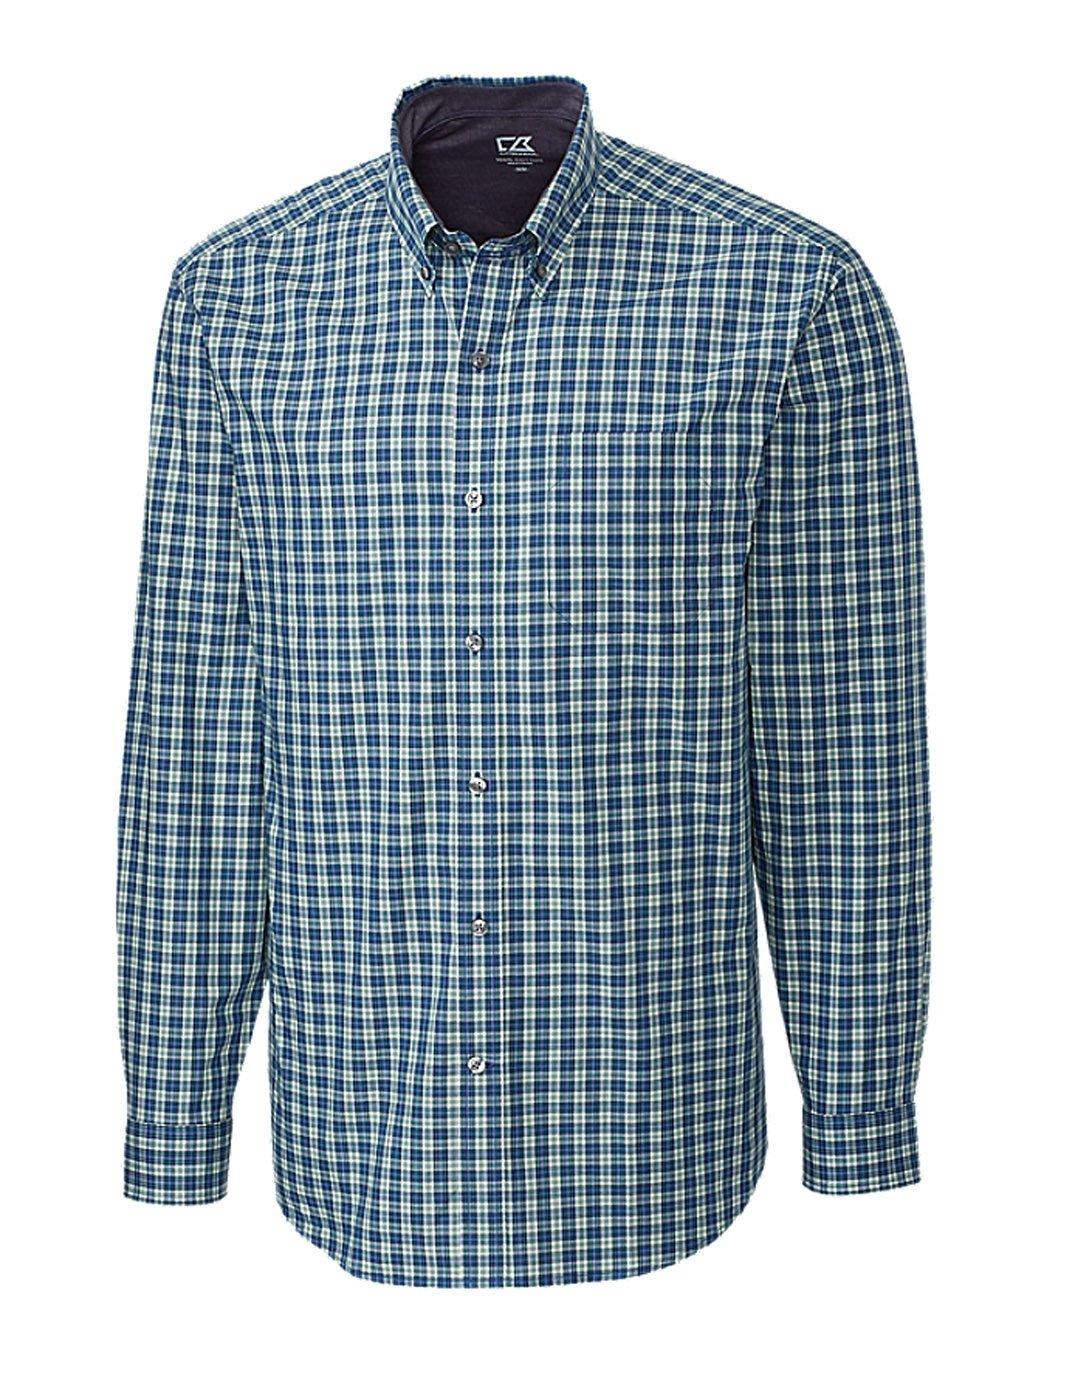 Cutter & Buck Men's Big-Tall Long Sleeve Thompson Plaid Woven Shirt, Multi, 3X/Big by Cutter & Buck (Image #1)